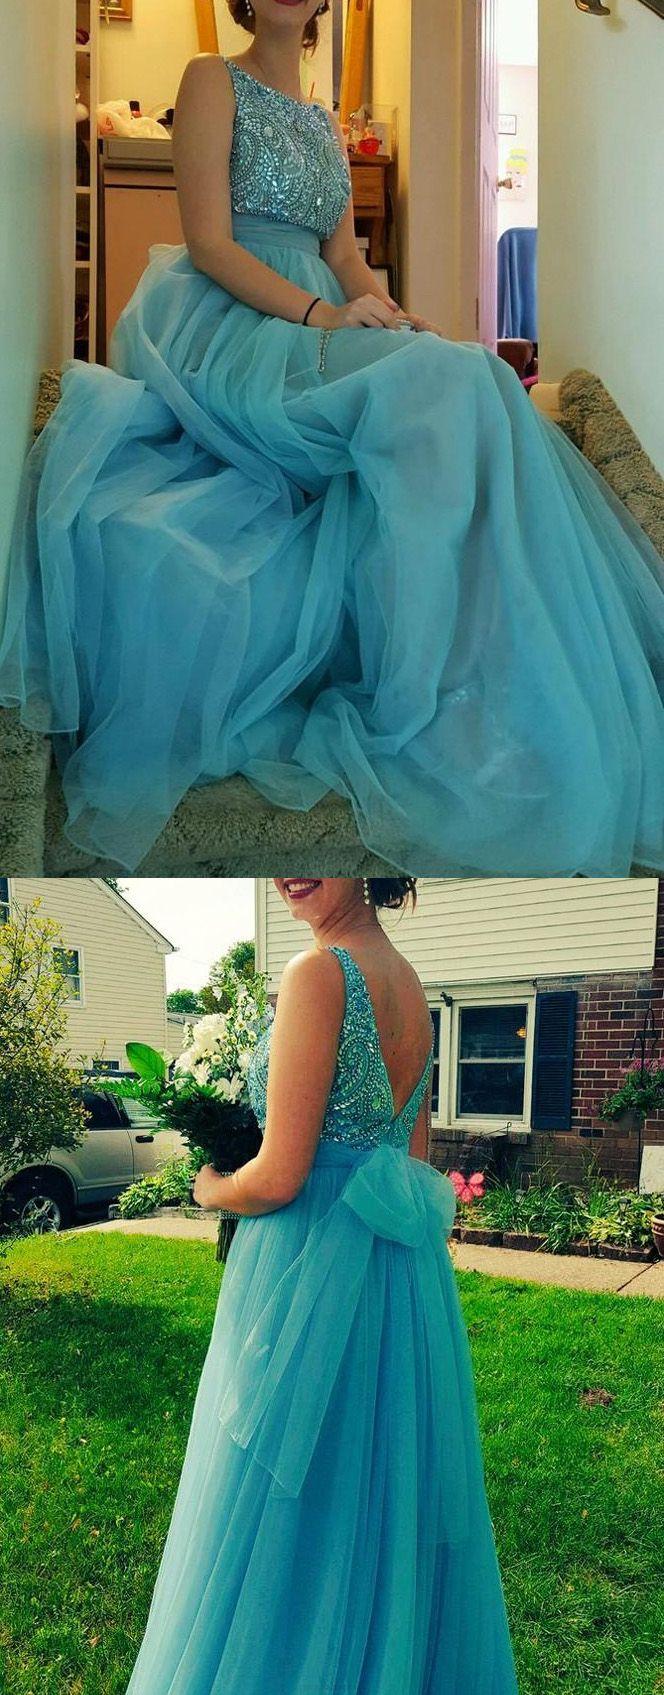 Bateau evening dresses light blue long evening dresses chic prom